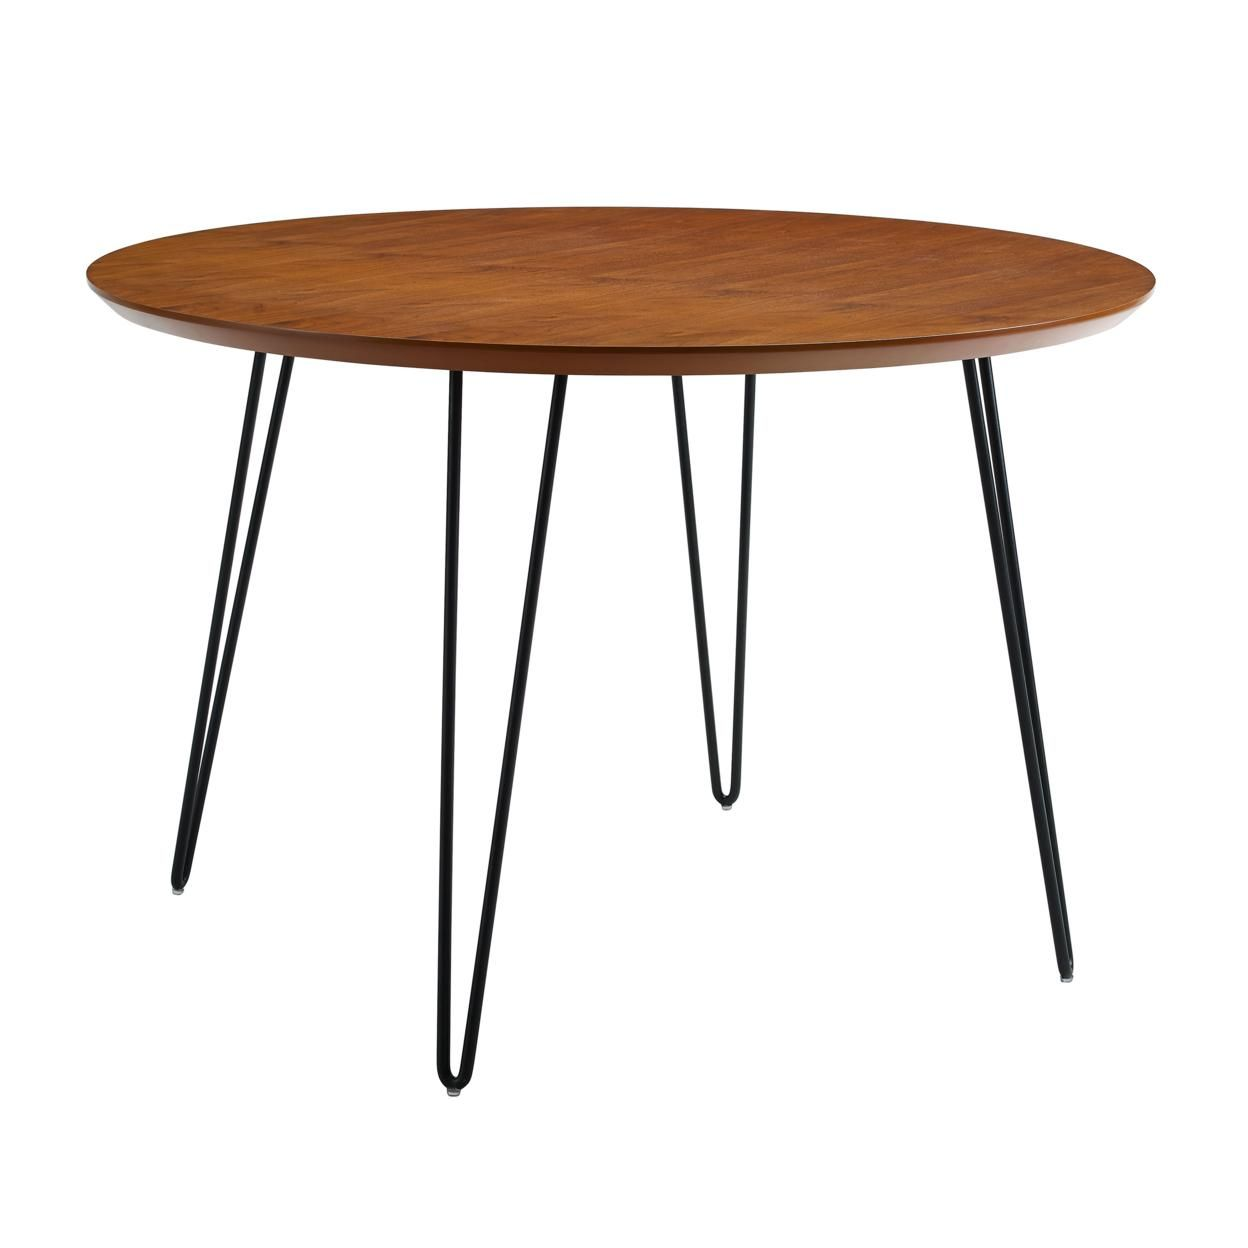 "46"" Round Hairpin Leg Dining Table - Walnut ��� ��� ��� ��� ���"